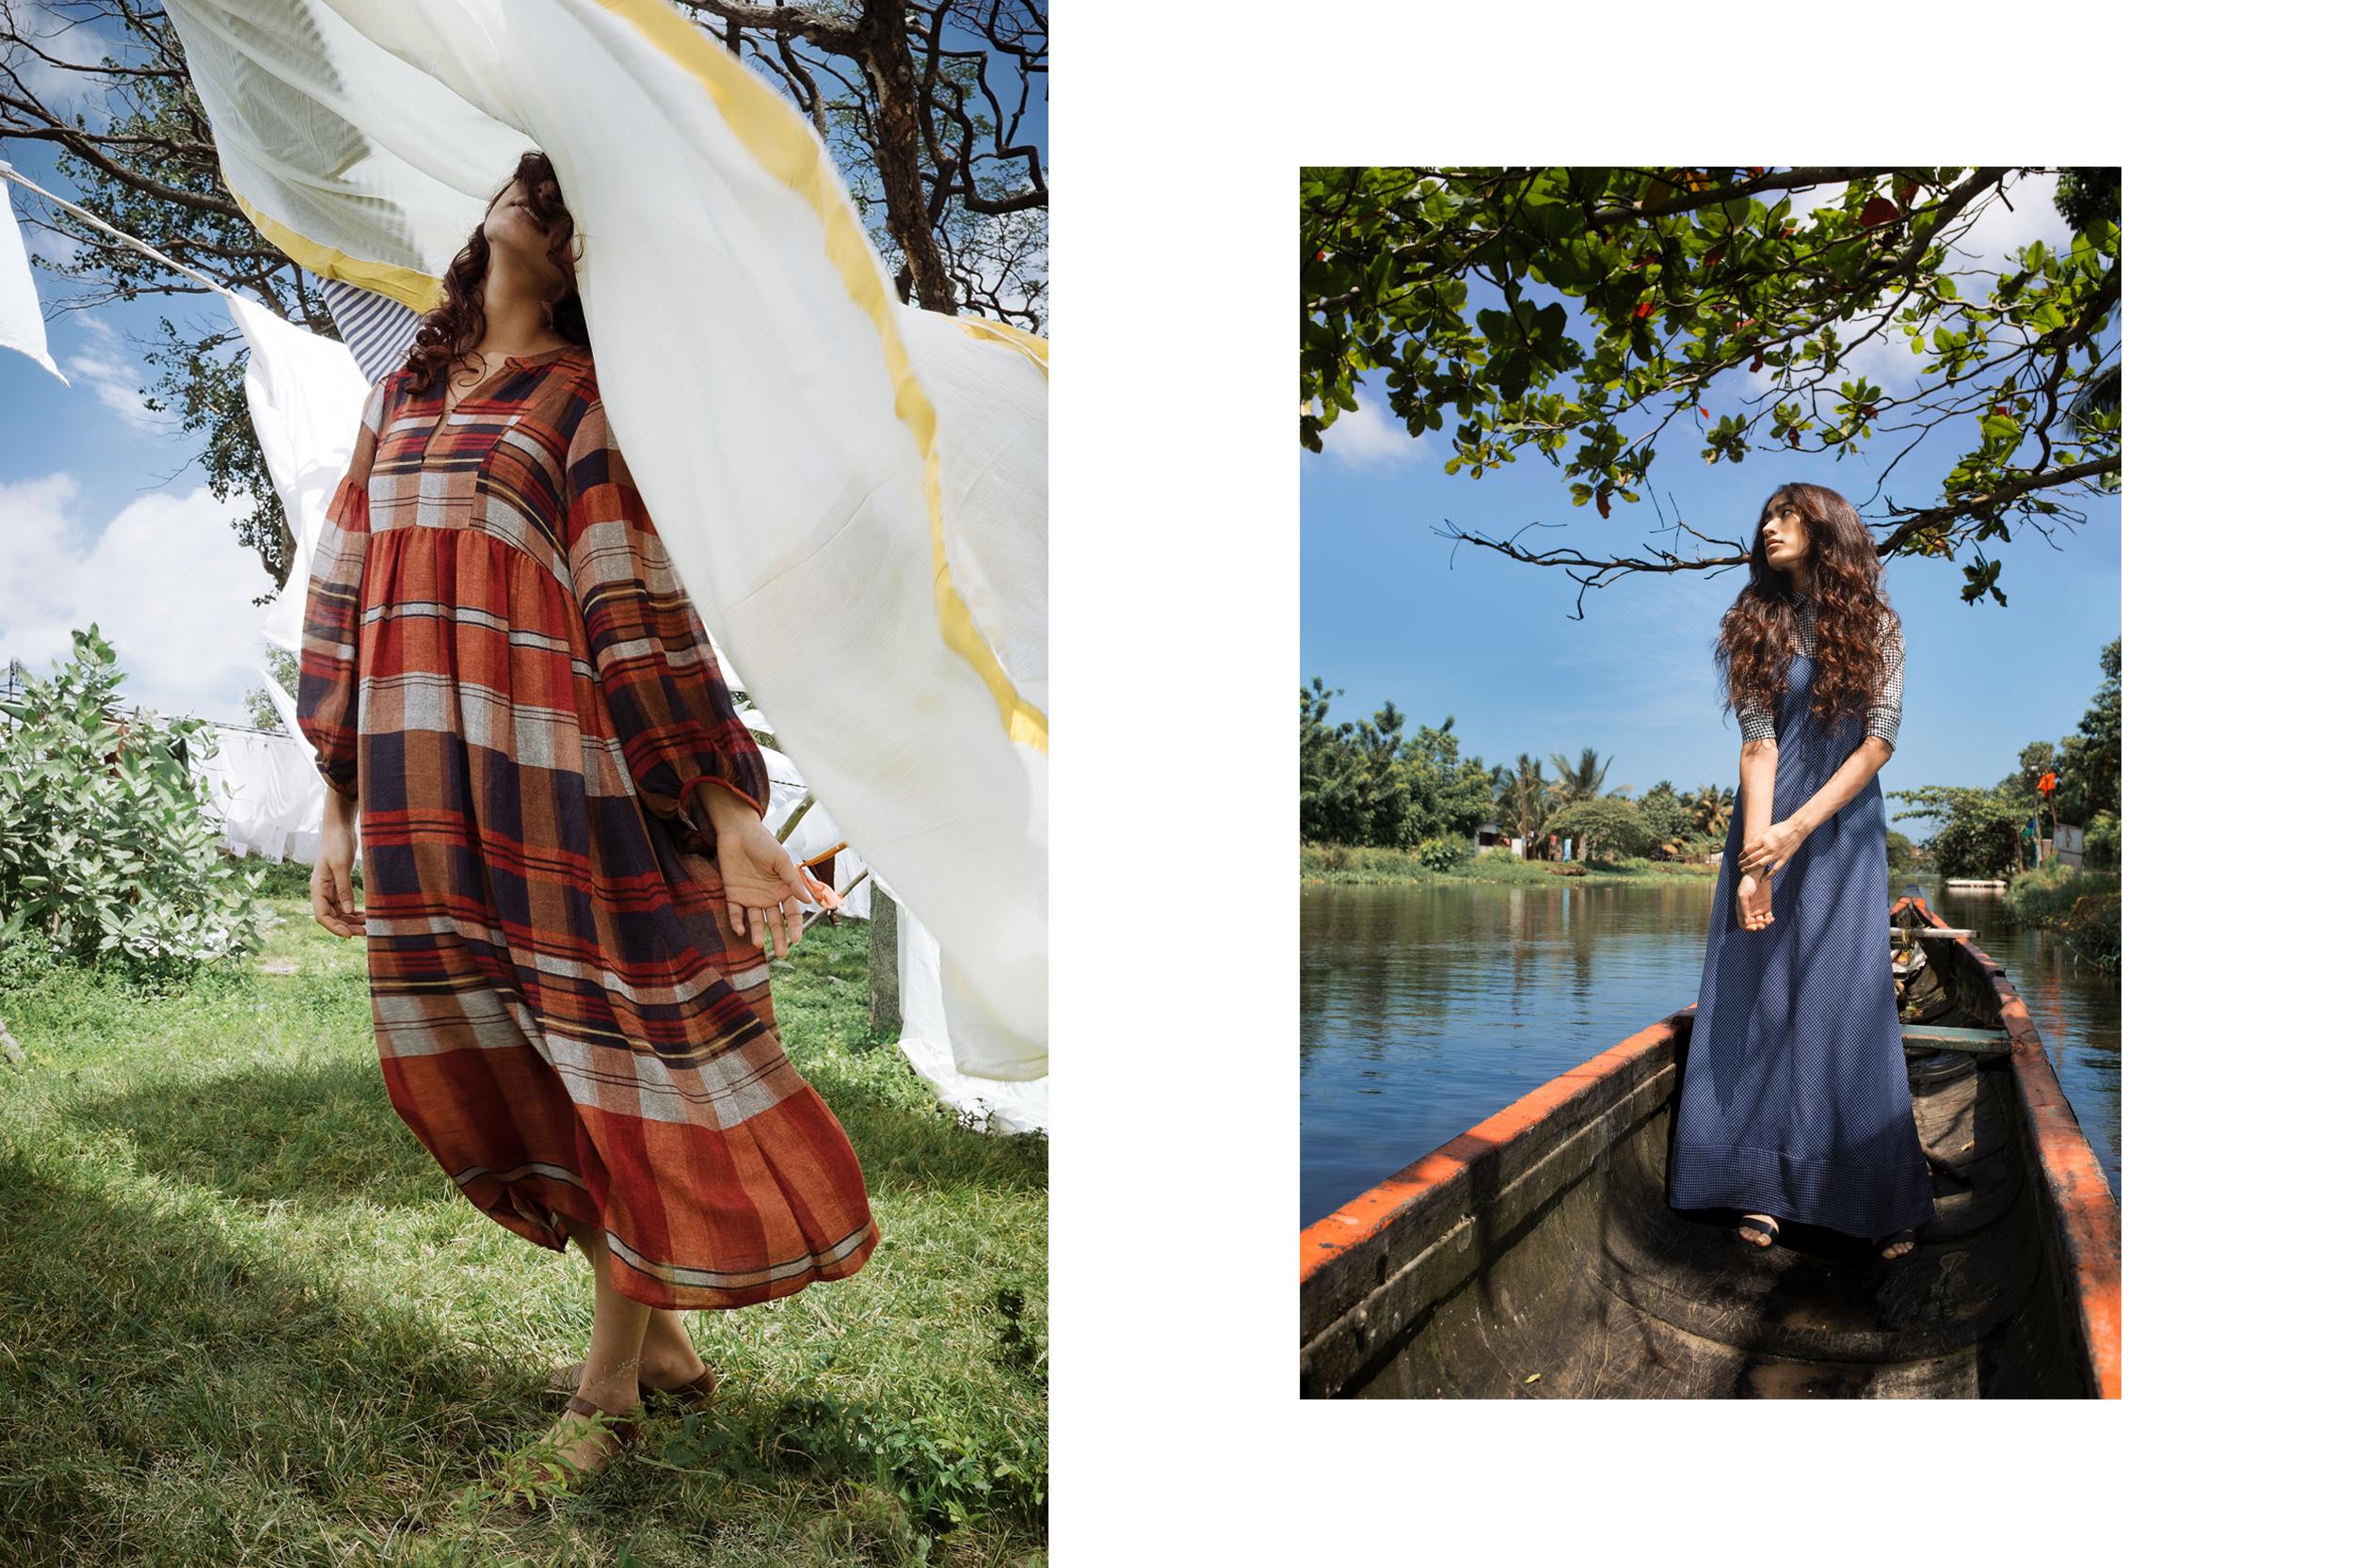 Sindhur_Photography_Fashion_Gloria tep_24.jpg